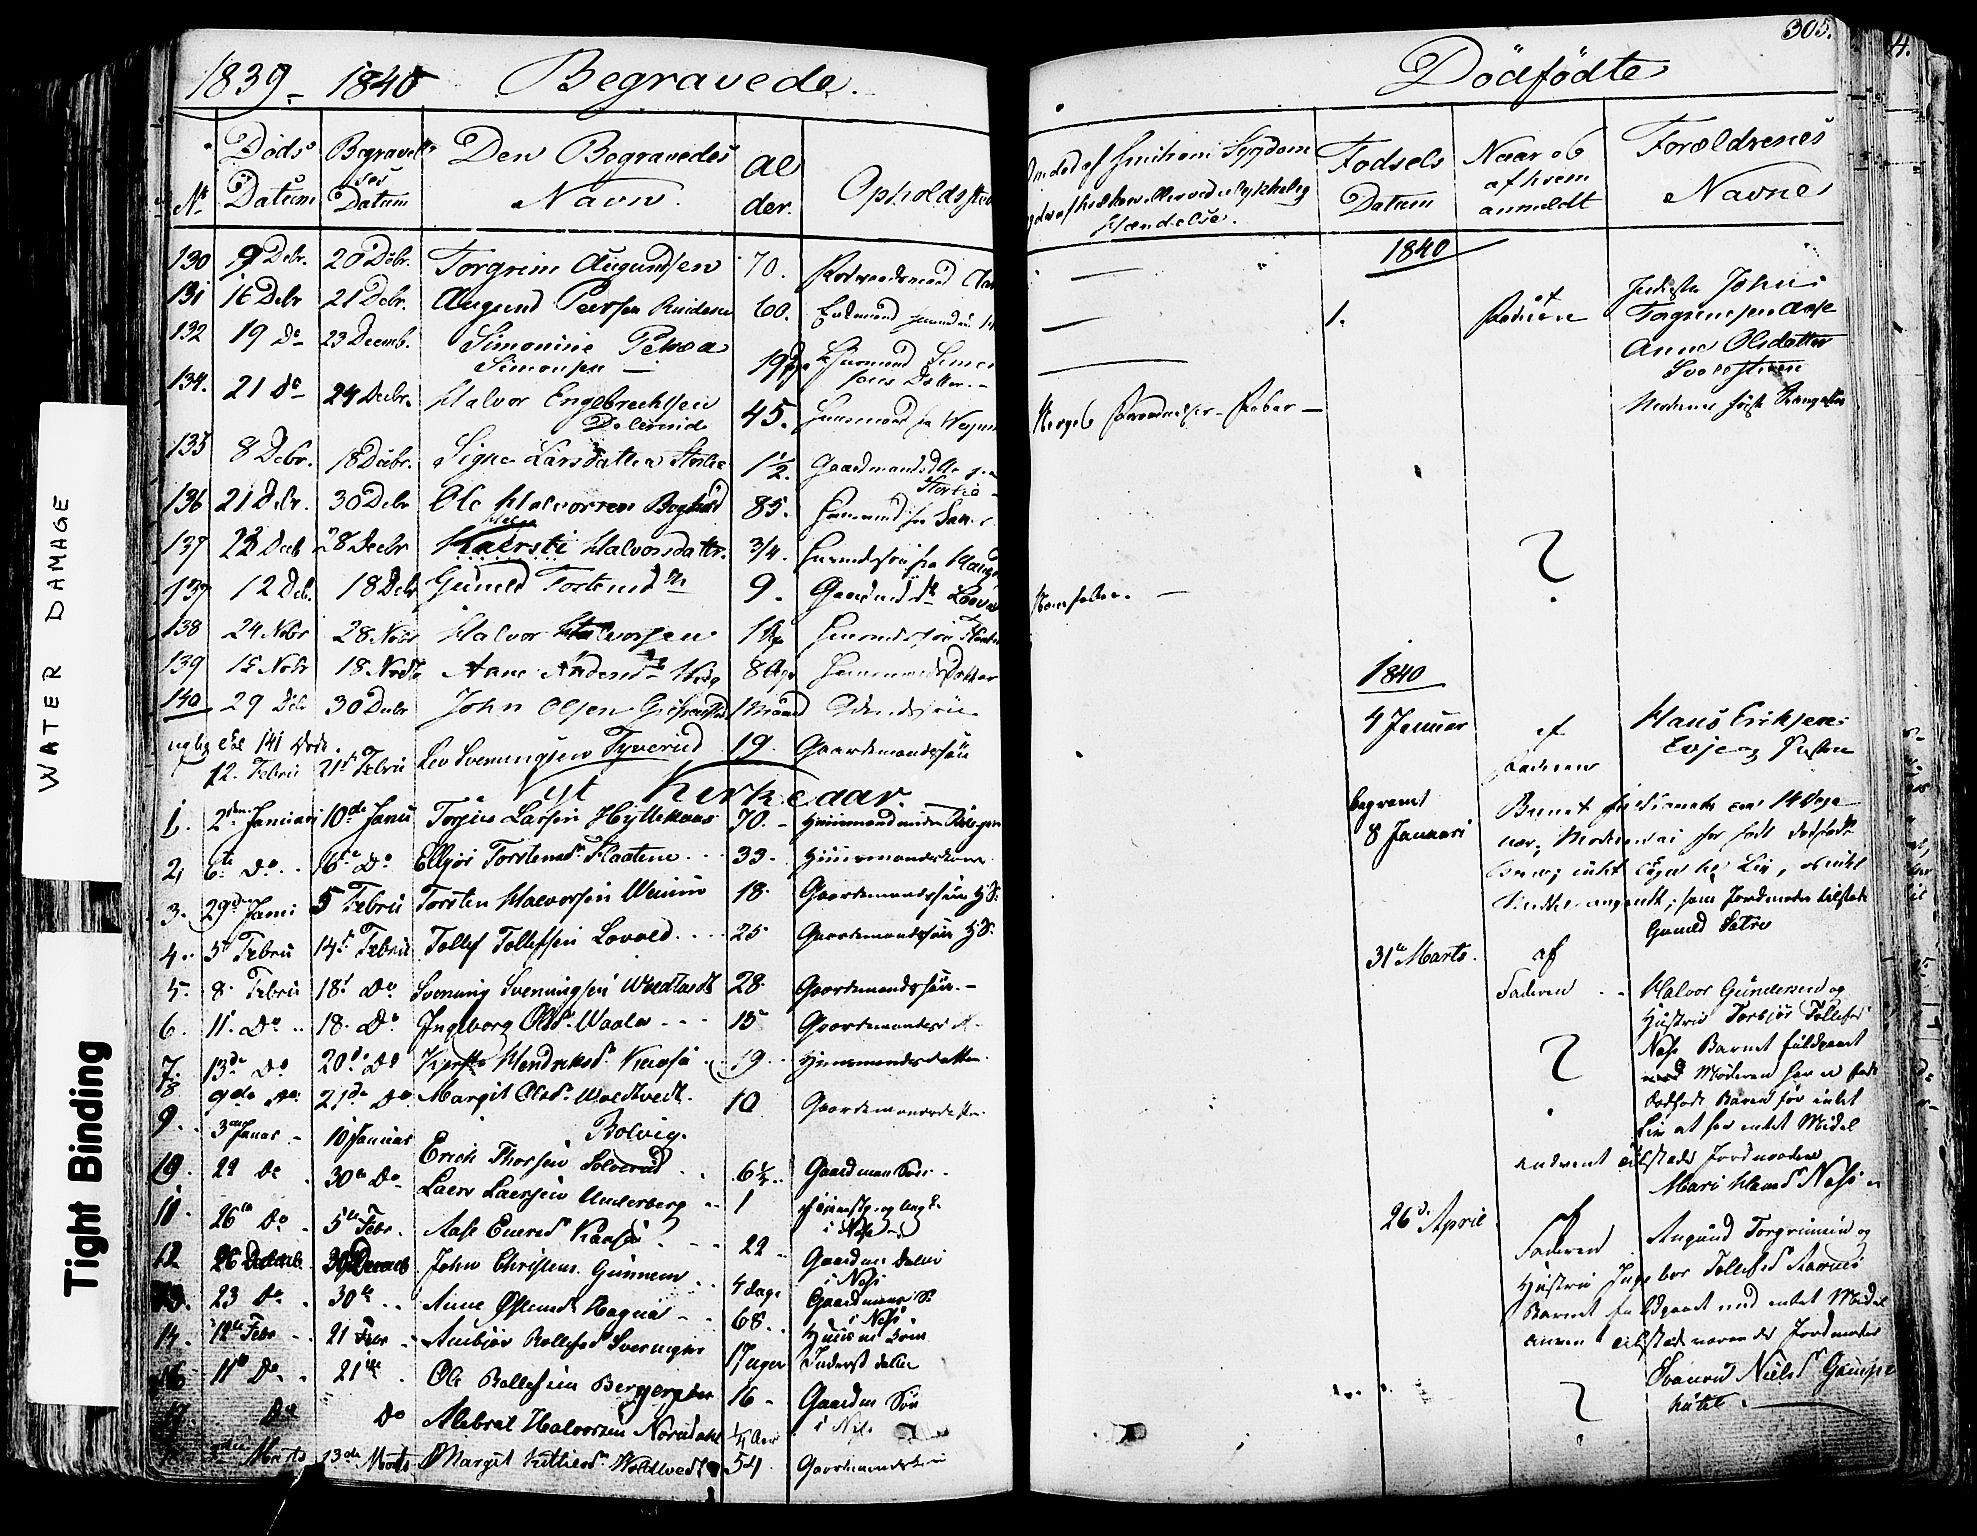 SAKO, Sauherad kirkebøker, F/Fa/L0006: Ministerialbok nr. I 6, 1827-1850, s. 305